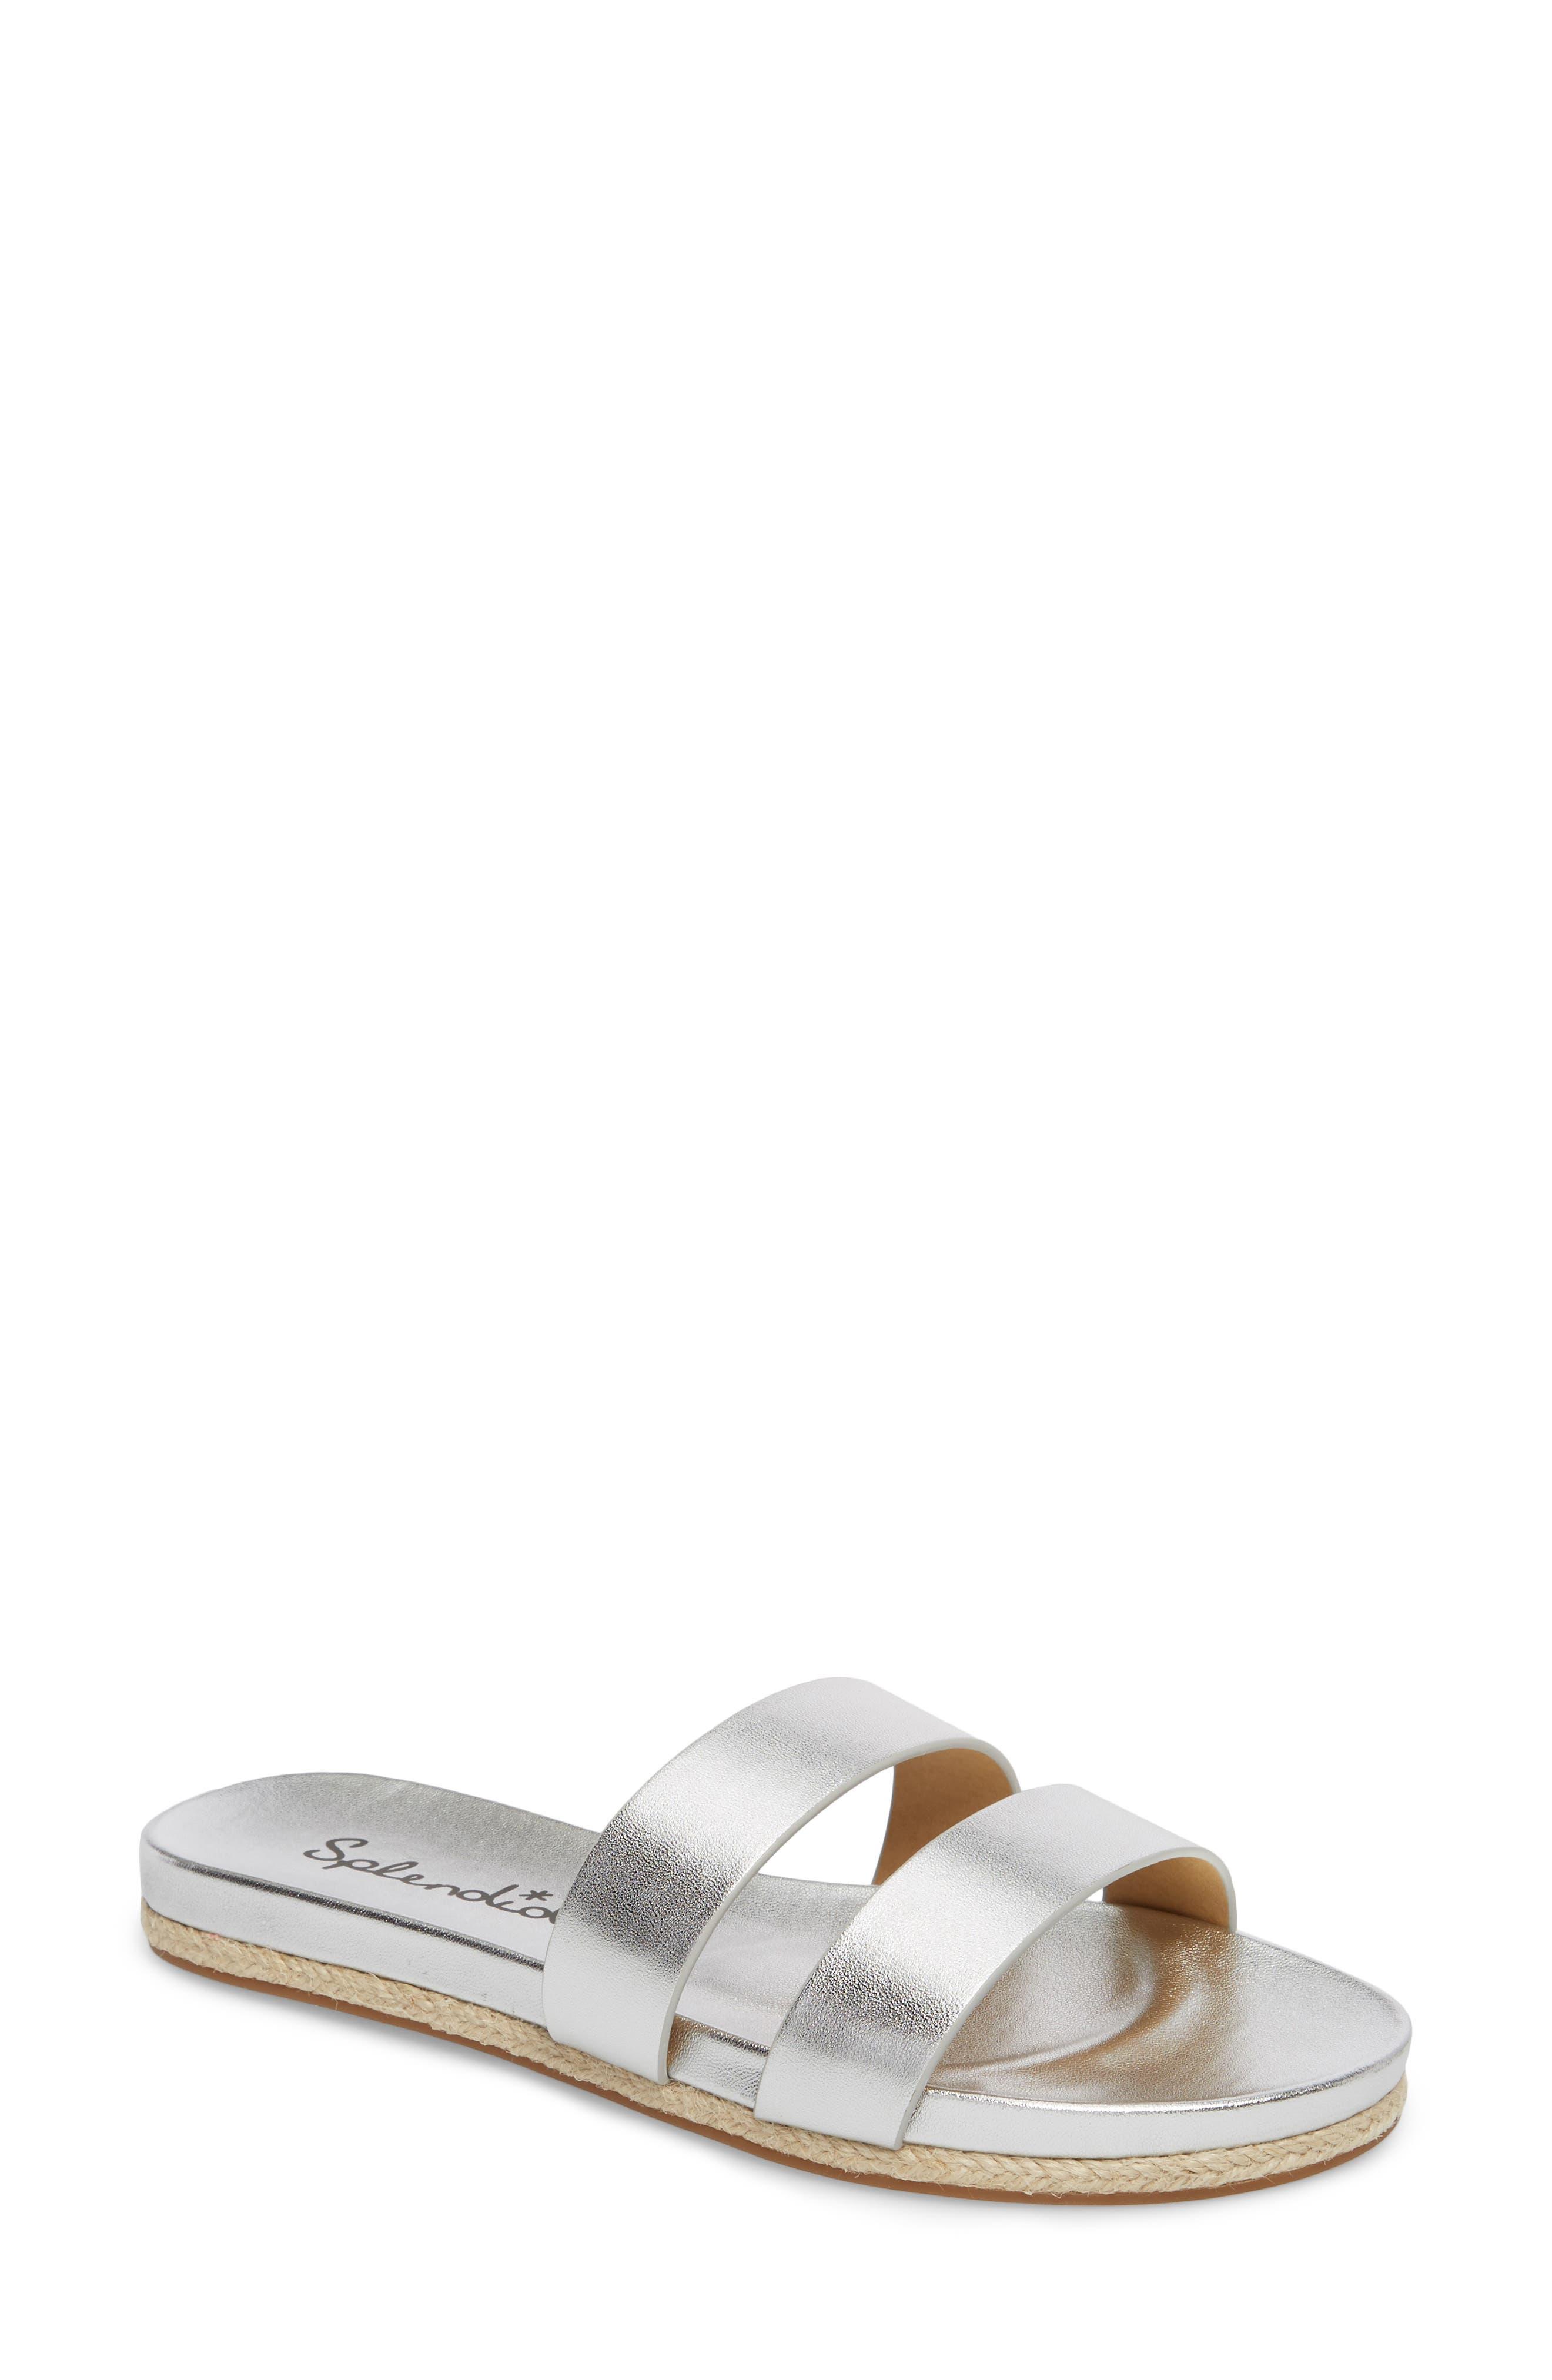 Brittani Slide Sandal,                         Main,                         color, Silver Metallic Leather